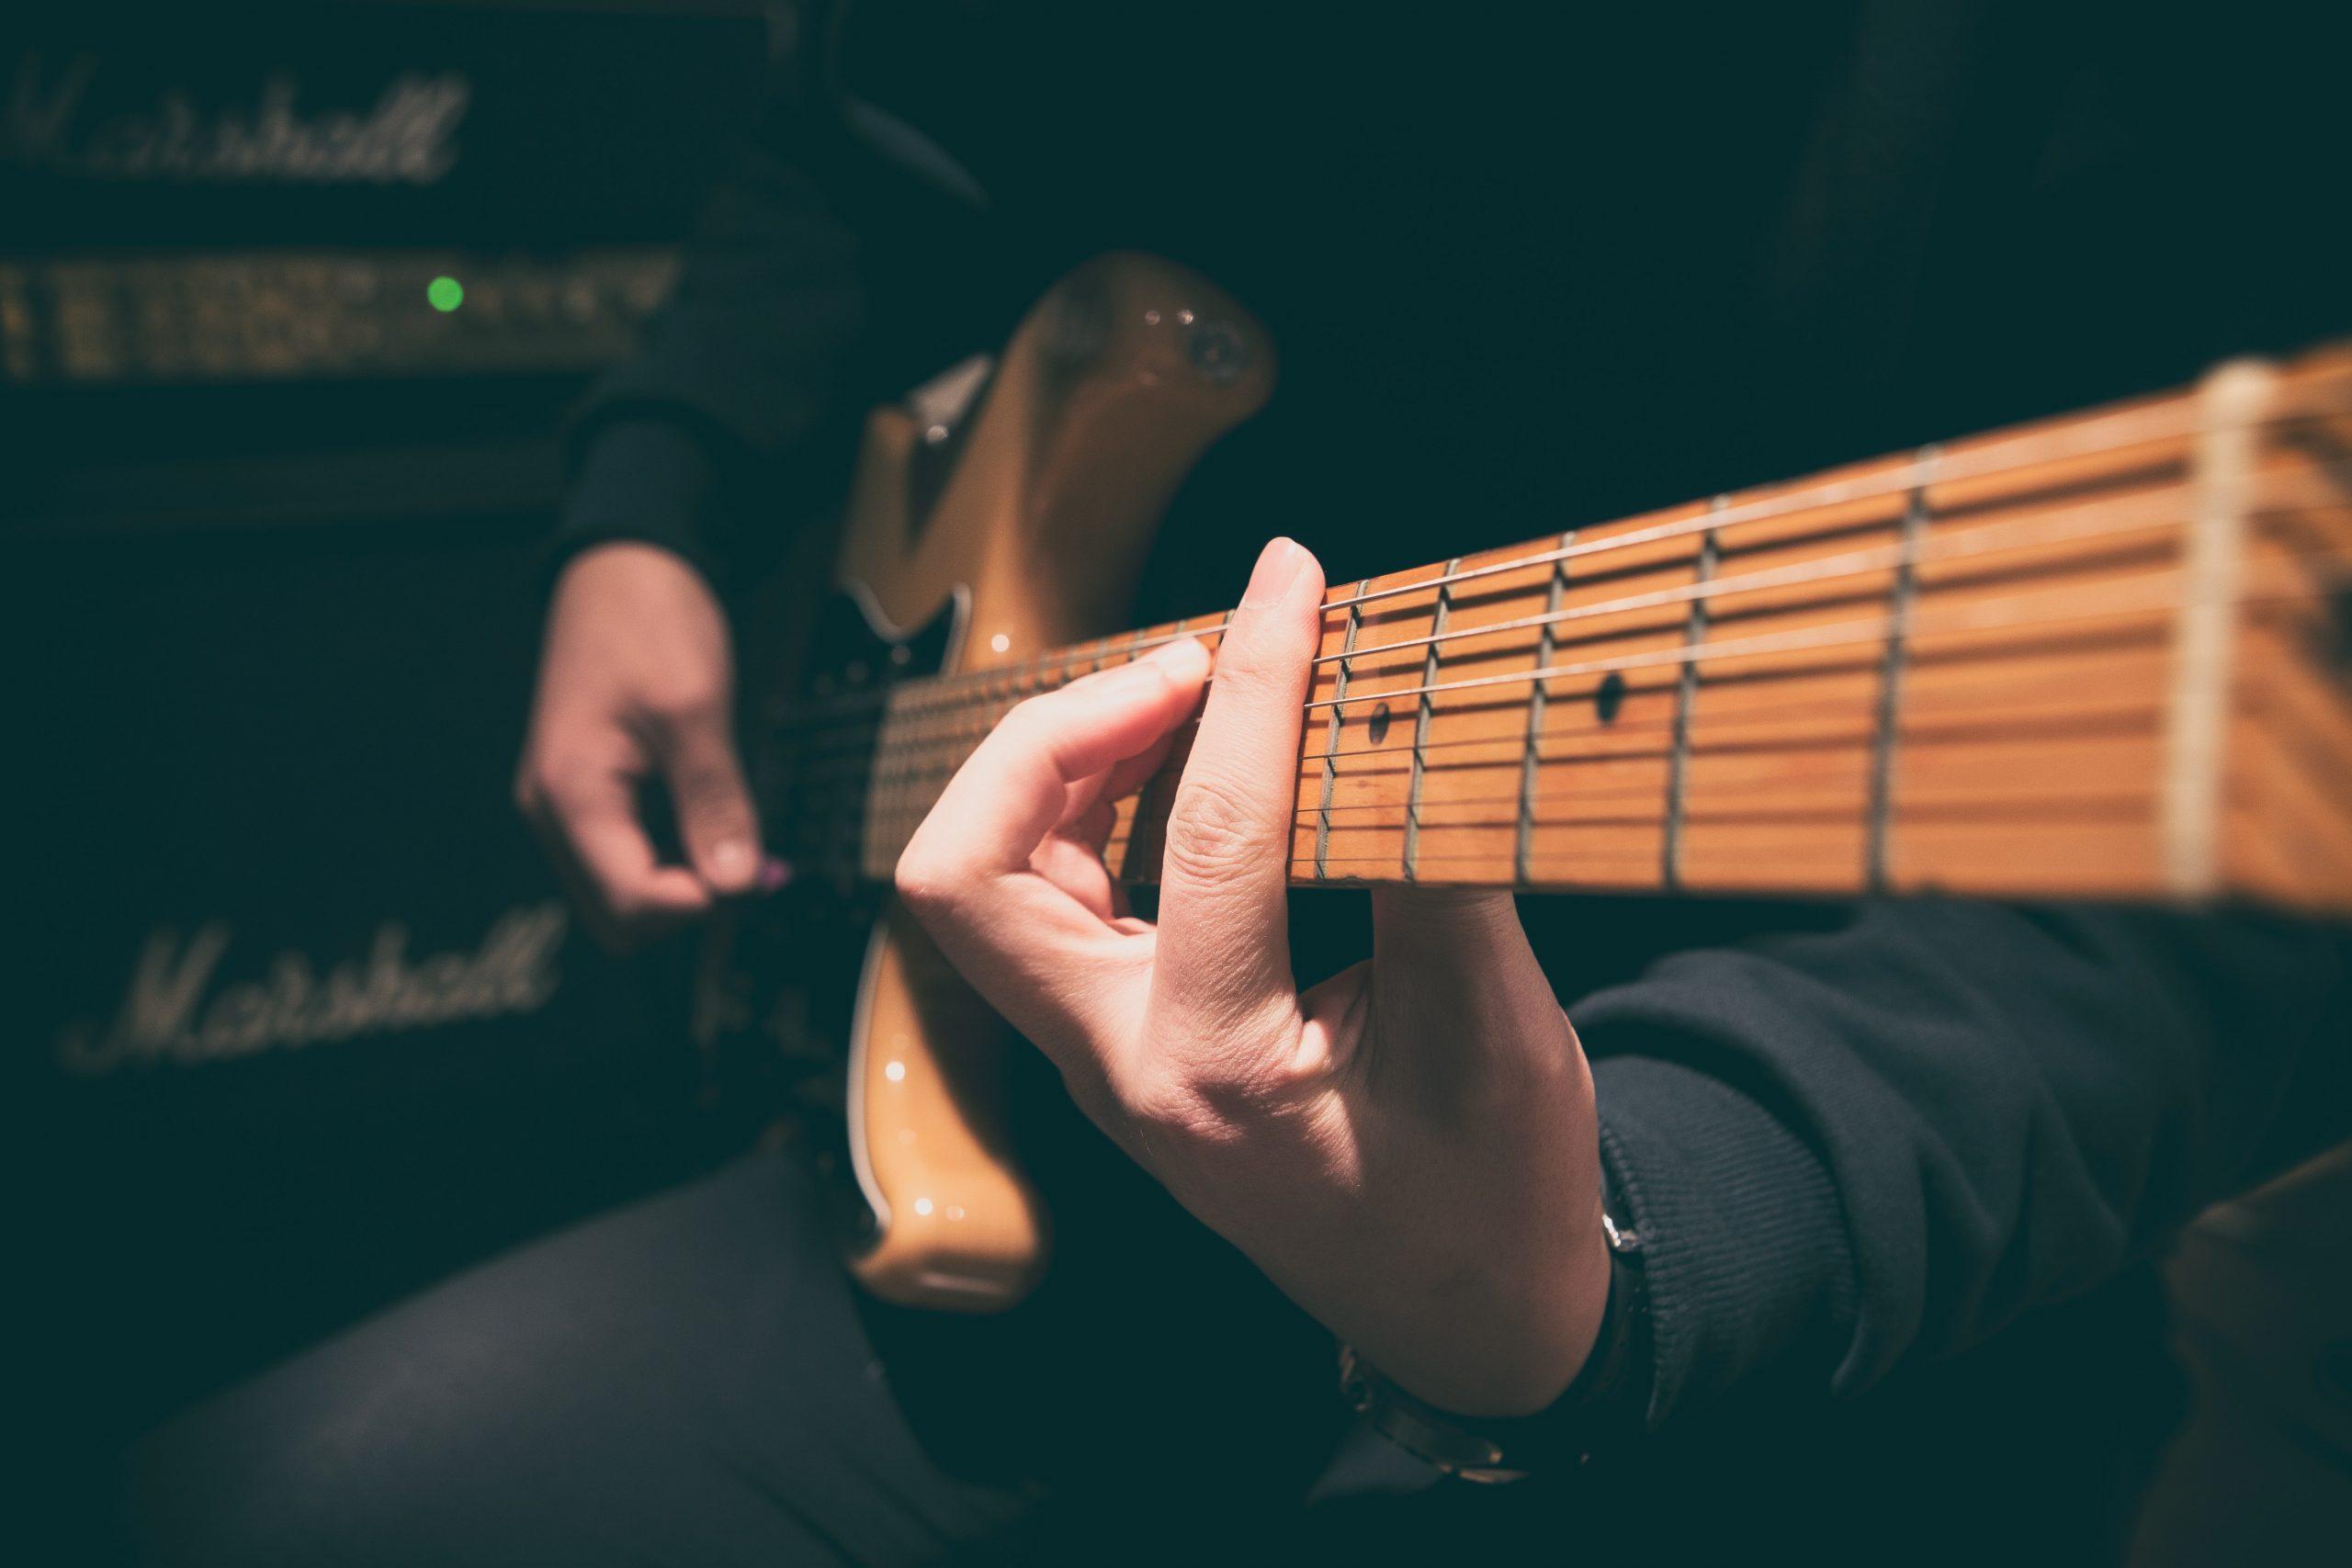 arte allegro - caged - escuela de musica online - guitarra